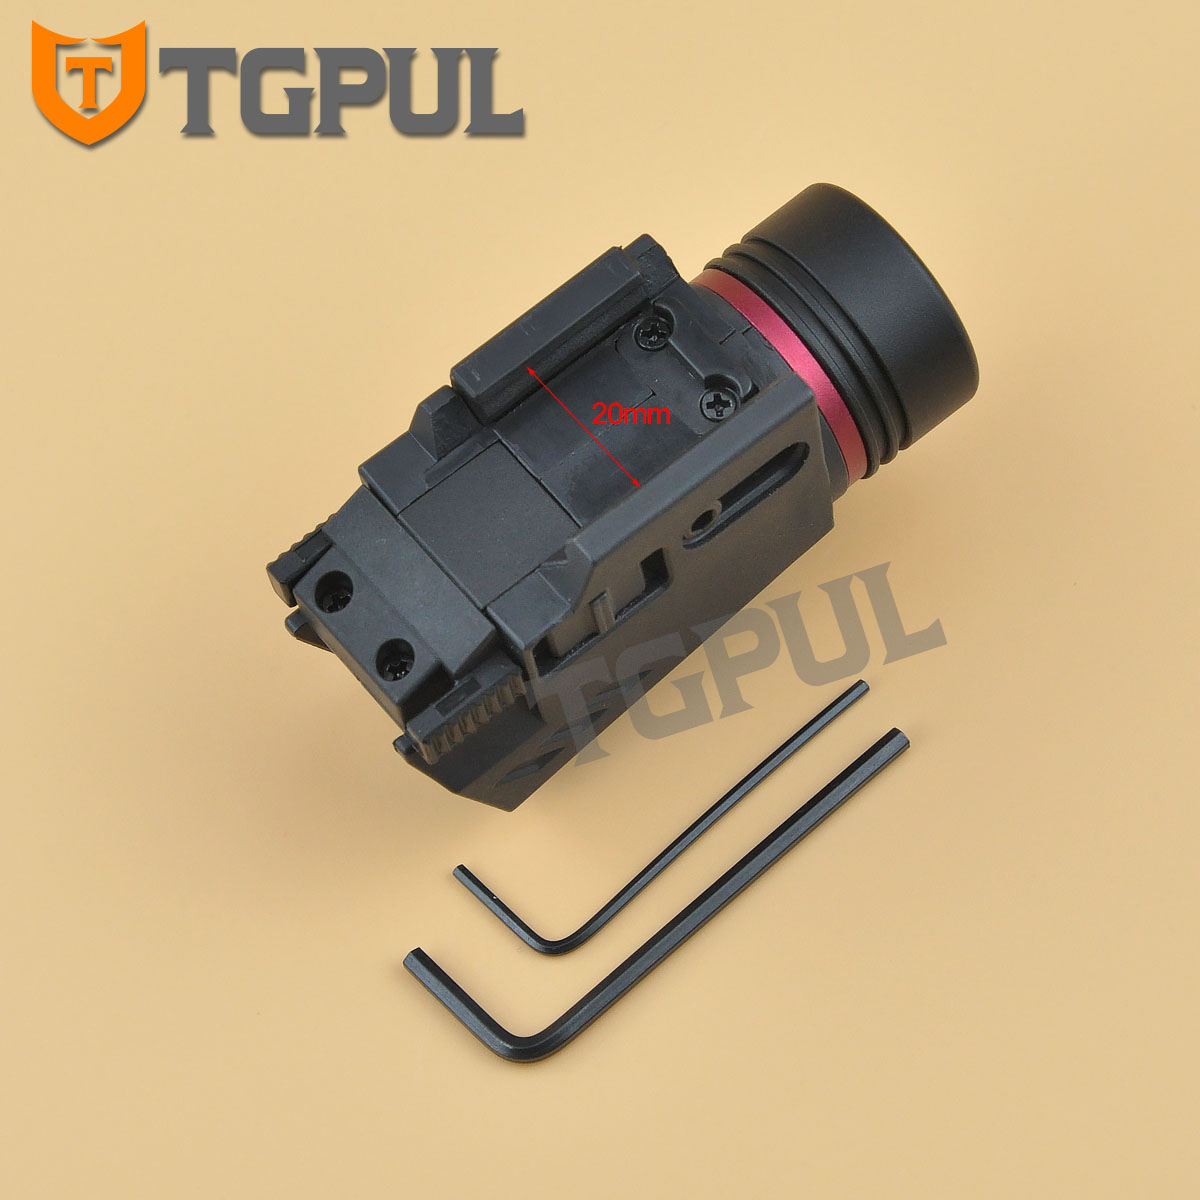 Tgpul lanterna laser vermelha tática, combo de